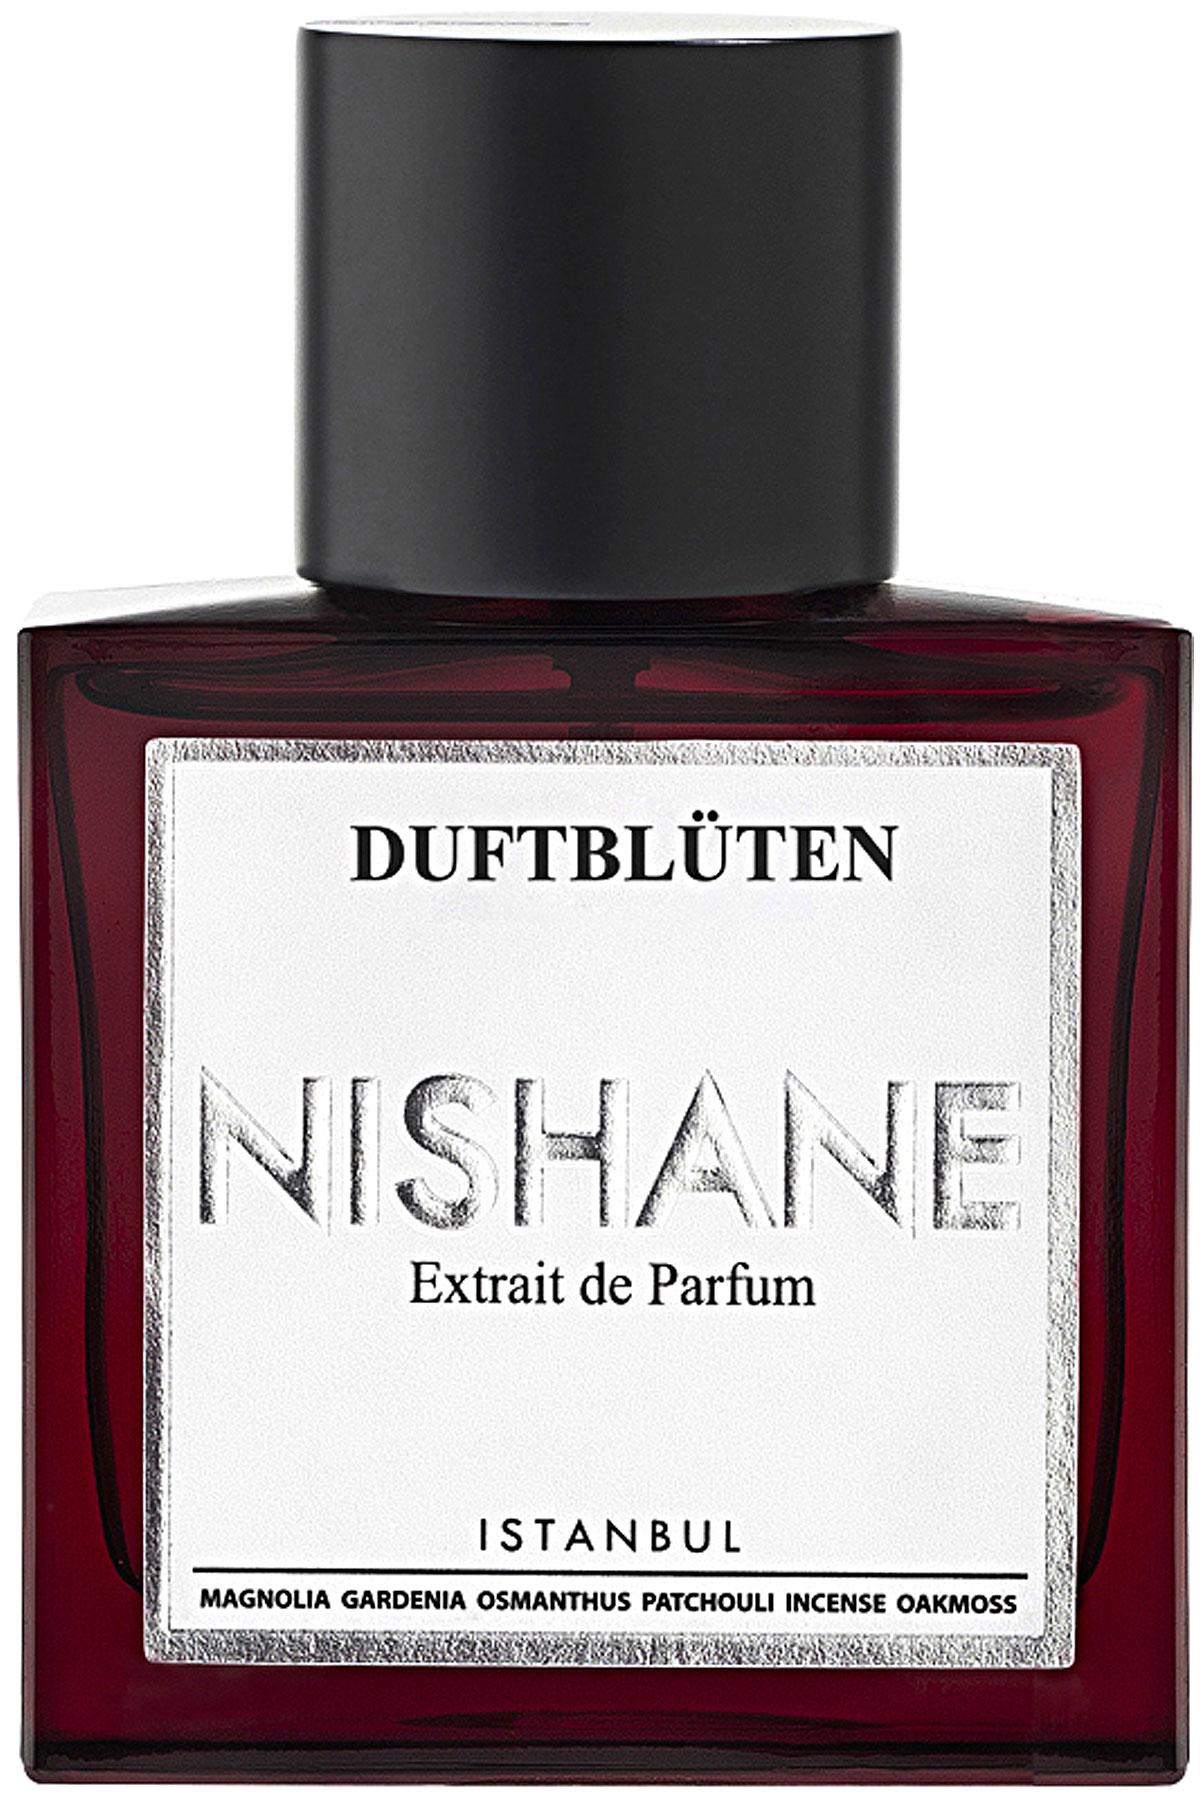 Nishane Fragrances for Women, Duftbluten - Extrait De Parfum - 50 Ml, 2019, 50 ml